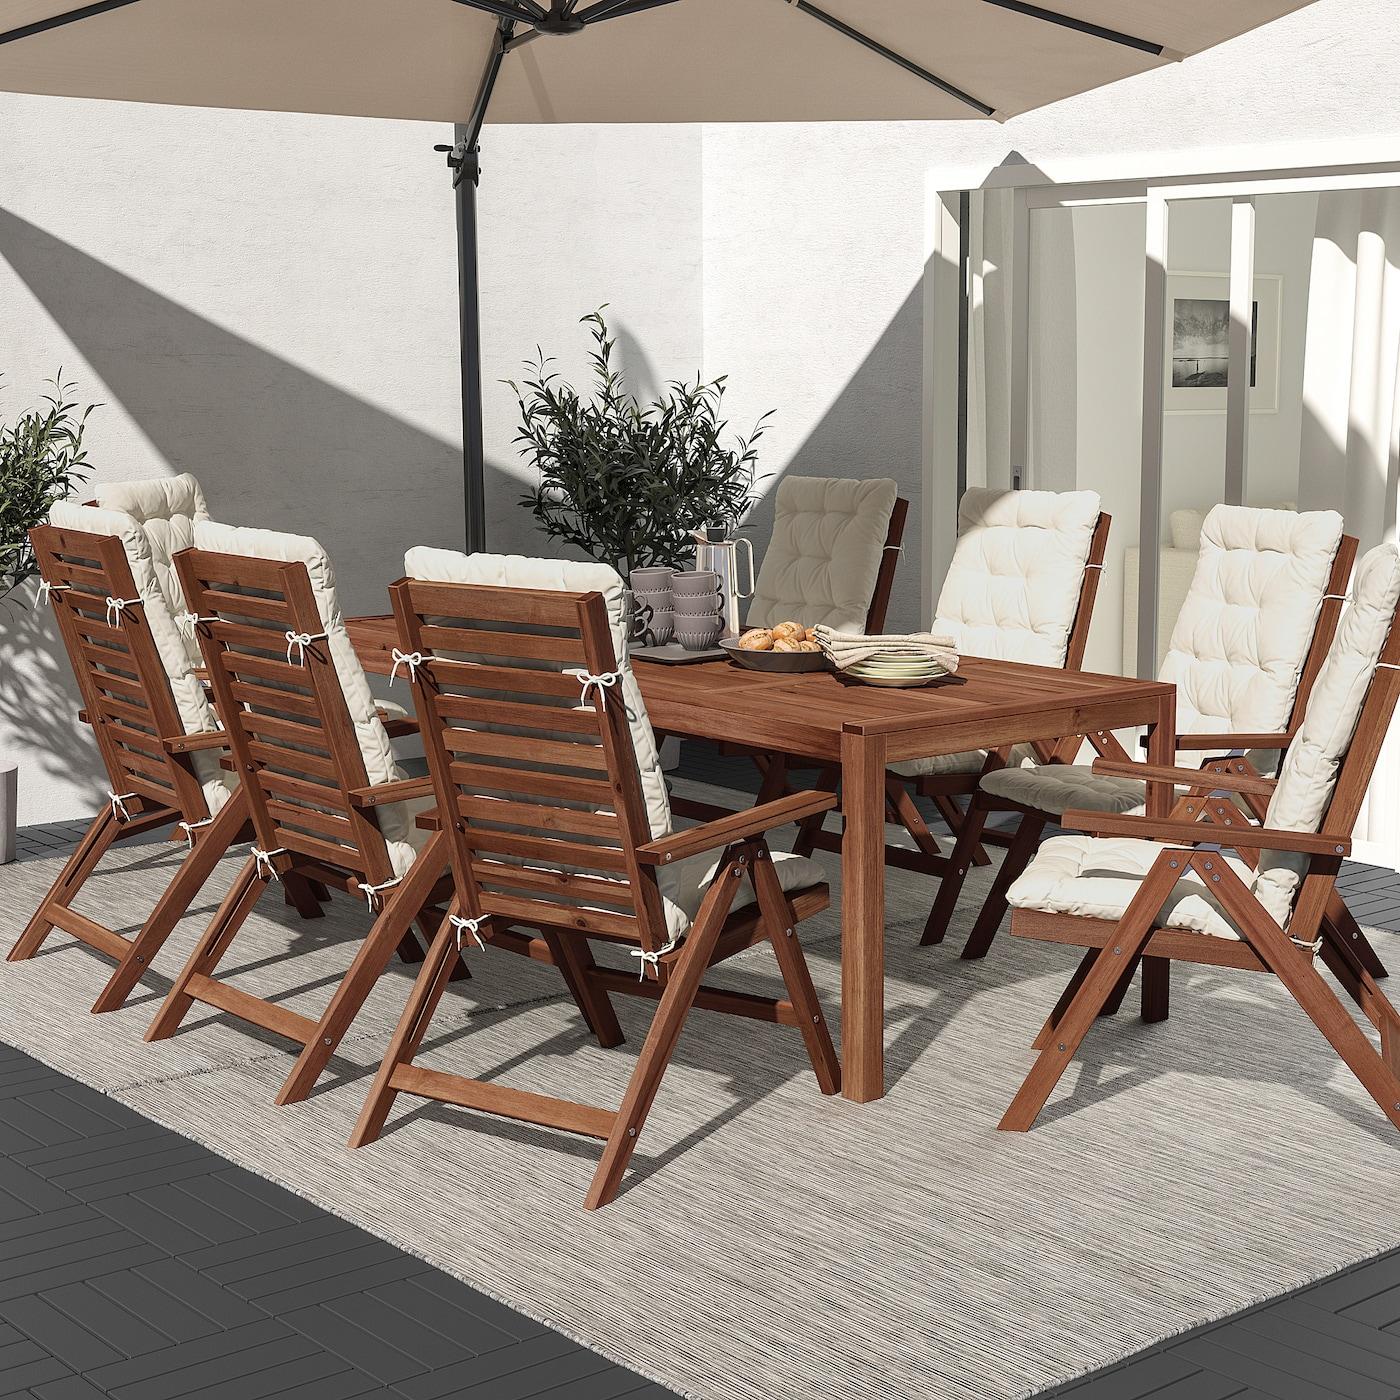 ÄPPLARÖ Bord+8 regulerbare stoler, utendørs, brunbeiset/Kuddarna beige